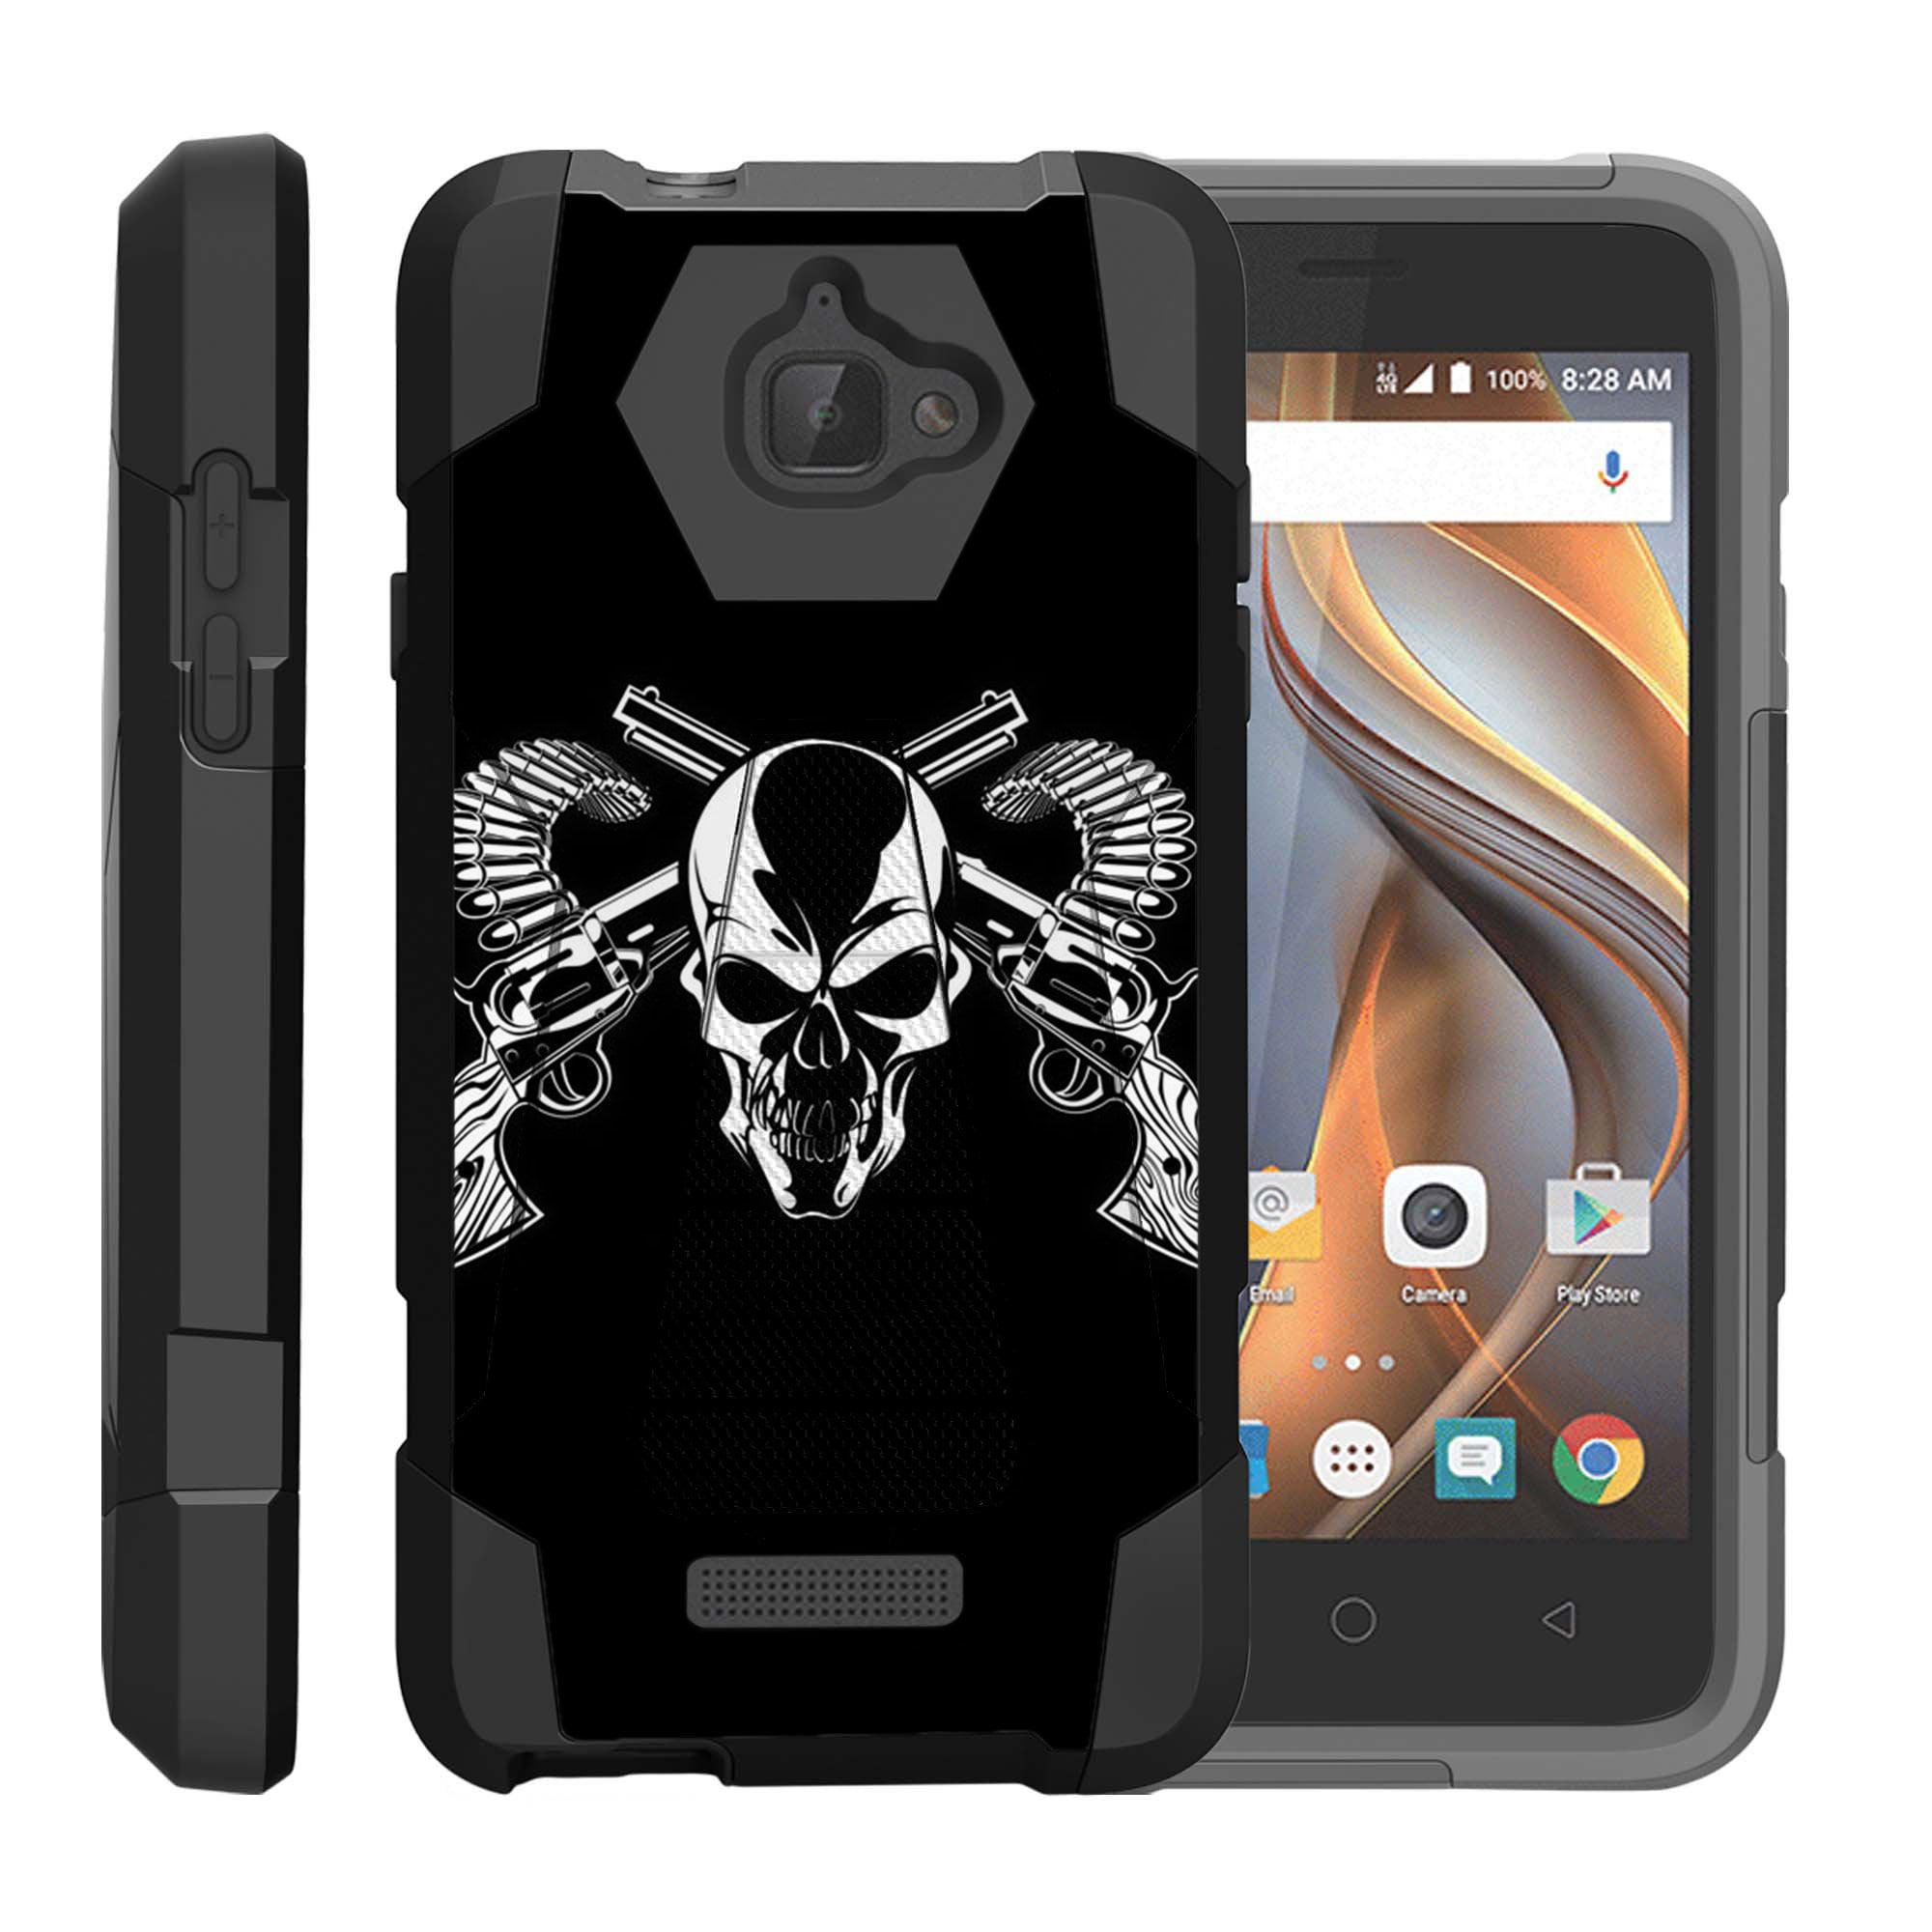 TurtleArmor ® | For Coolpad Catalyst 3622A [Dynamic Shell] Dual Layer Hybrid Silicone Hard Shell Kickstand Case - Mercenary Skull